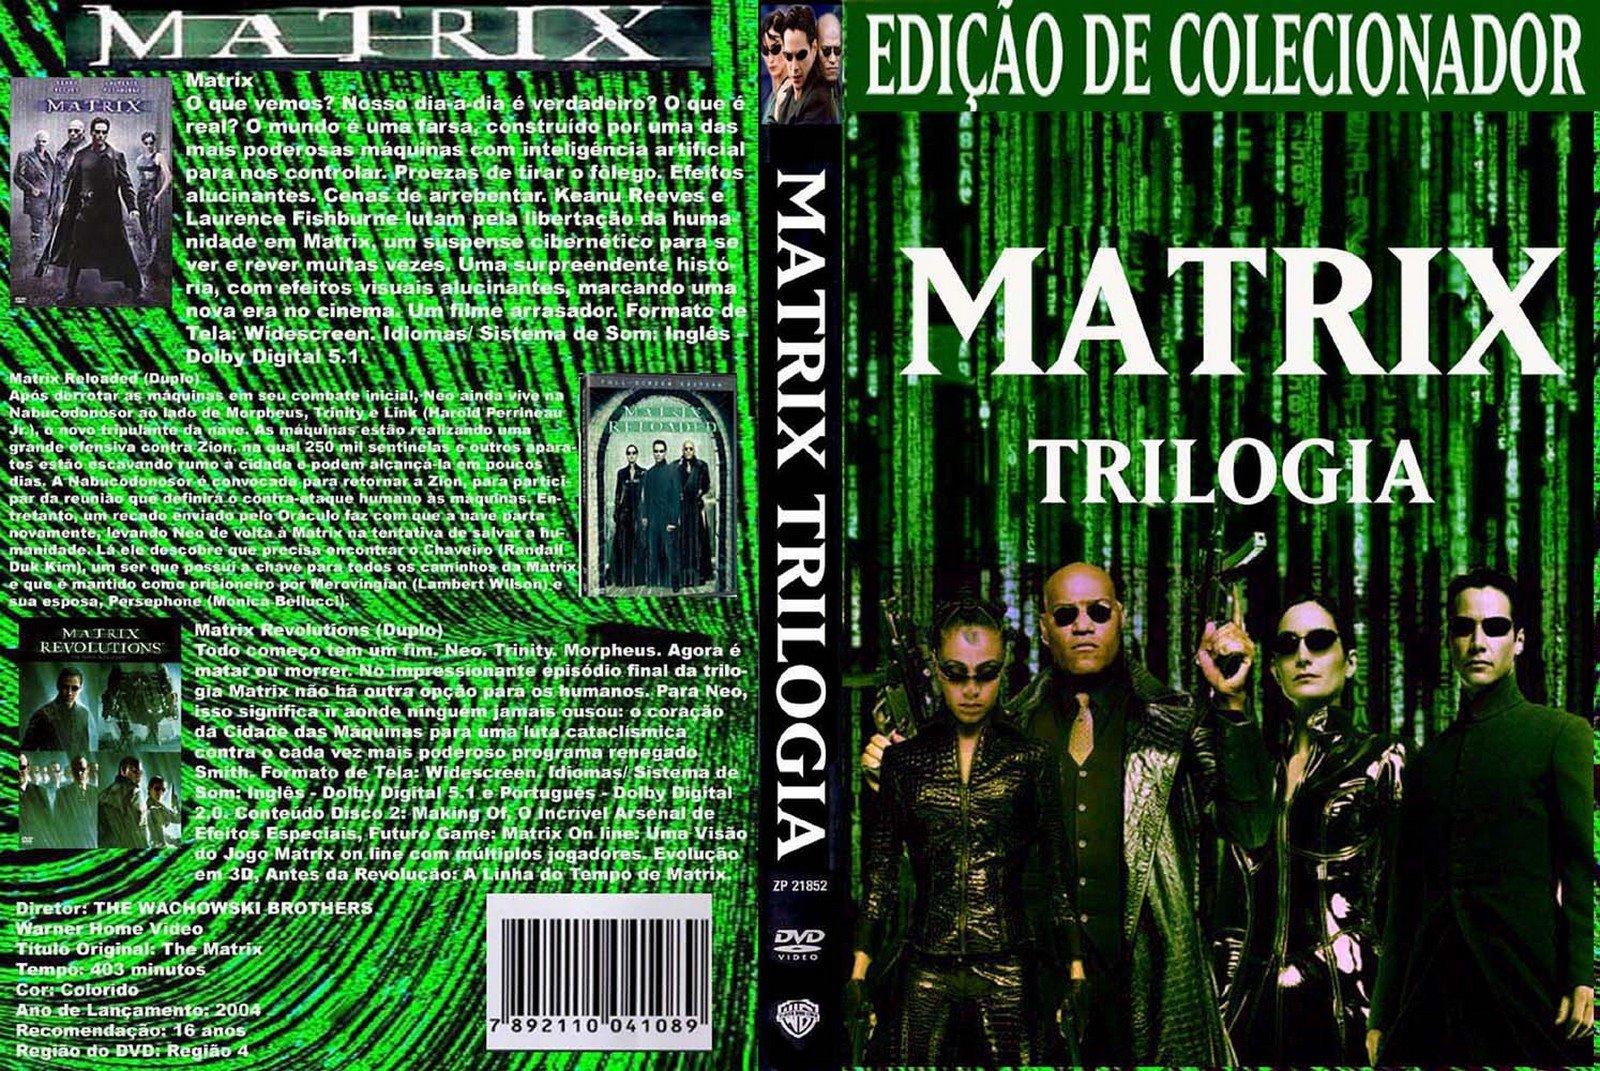 http://2.bp.blogspot.com/-fI4jSn-gV58/TY-6714BODI/AAAAAAAAEbI/C58GRzHnUFE/s1600/matrix-trilogia.jpg